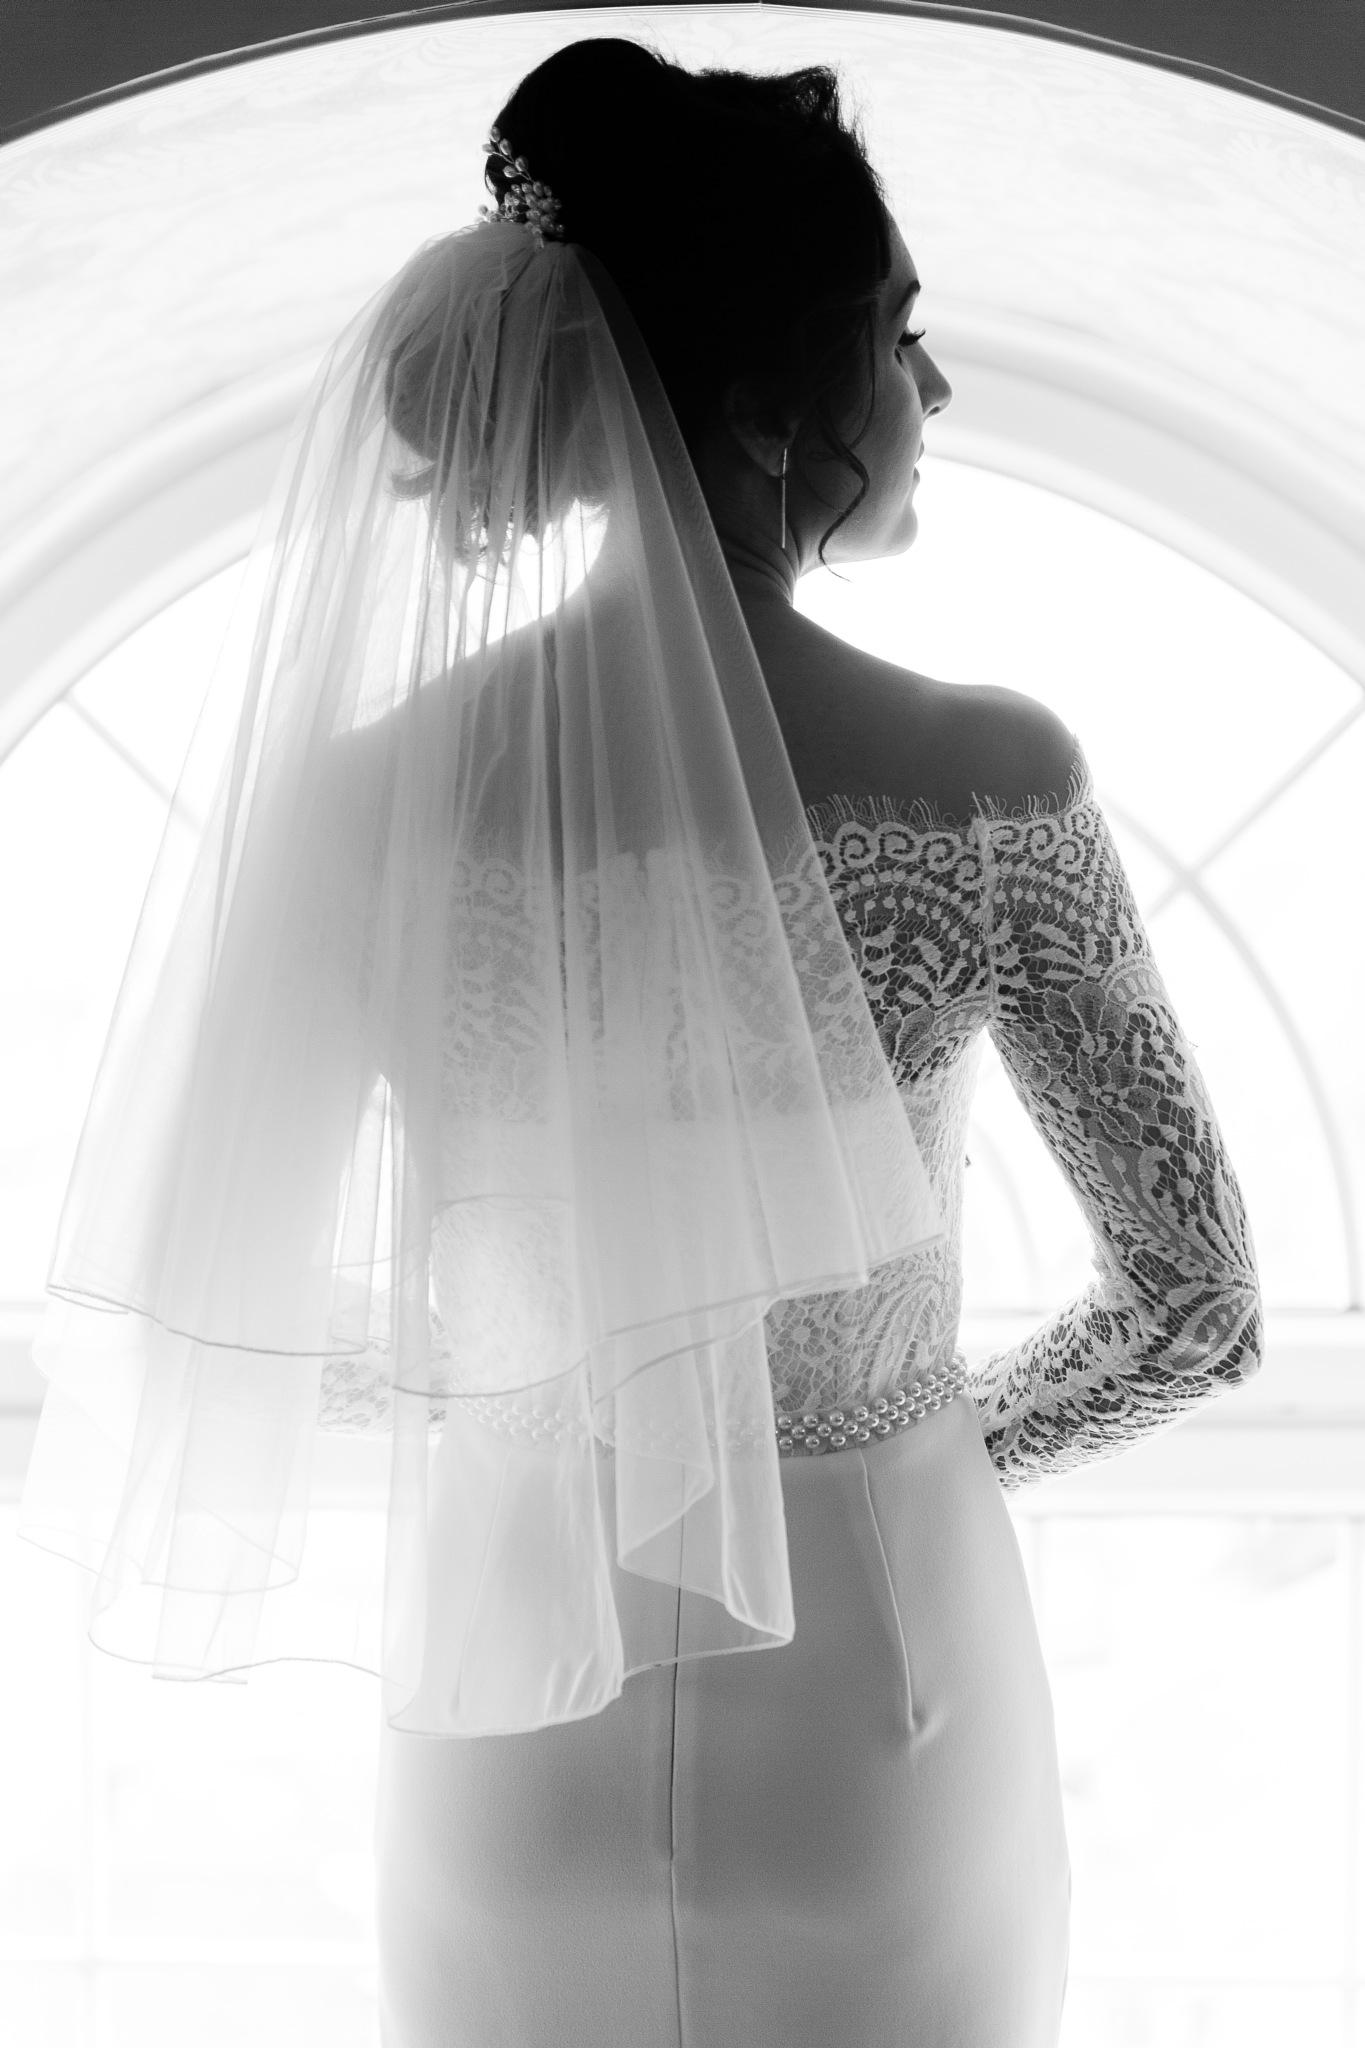 Backlit Bride by Paul Heathcote